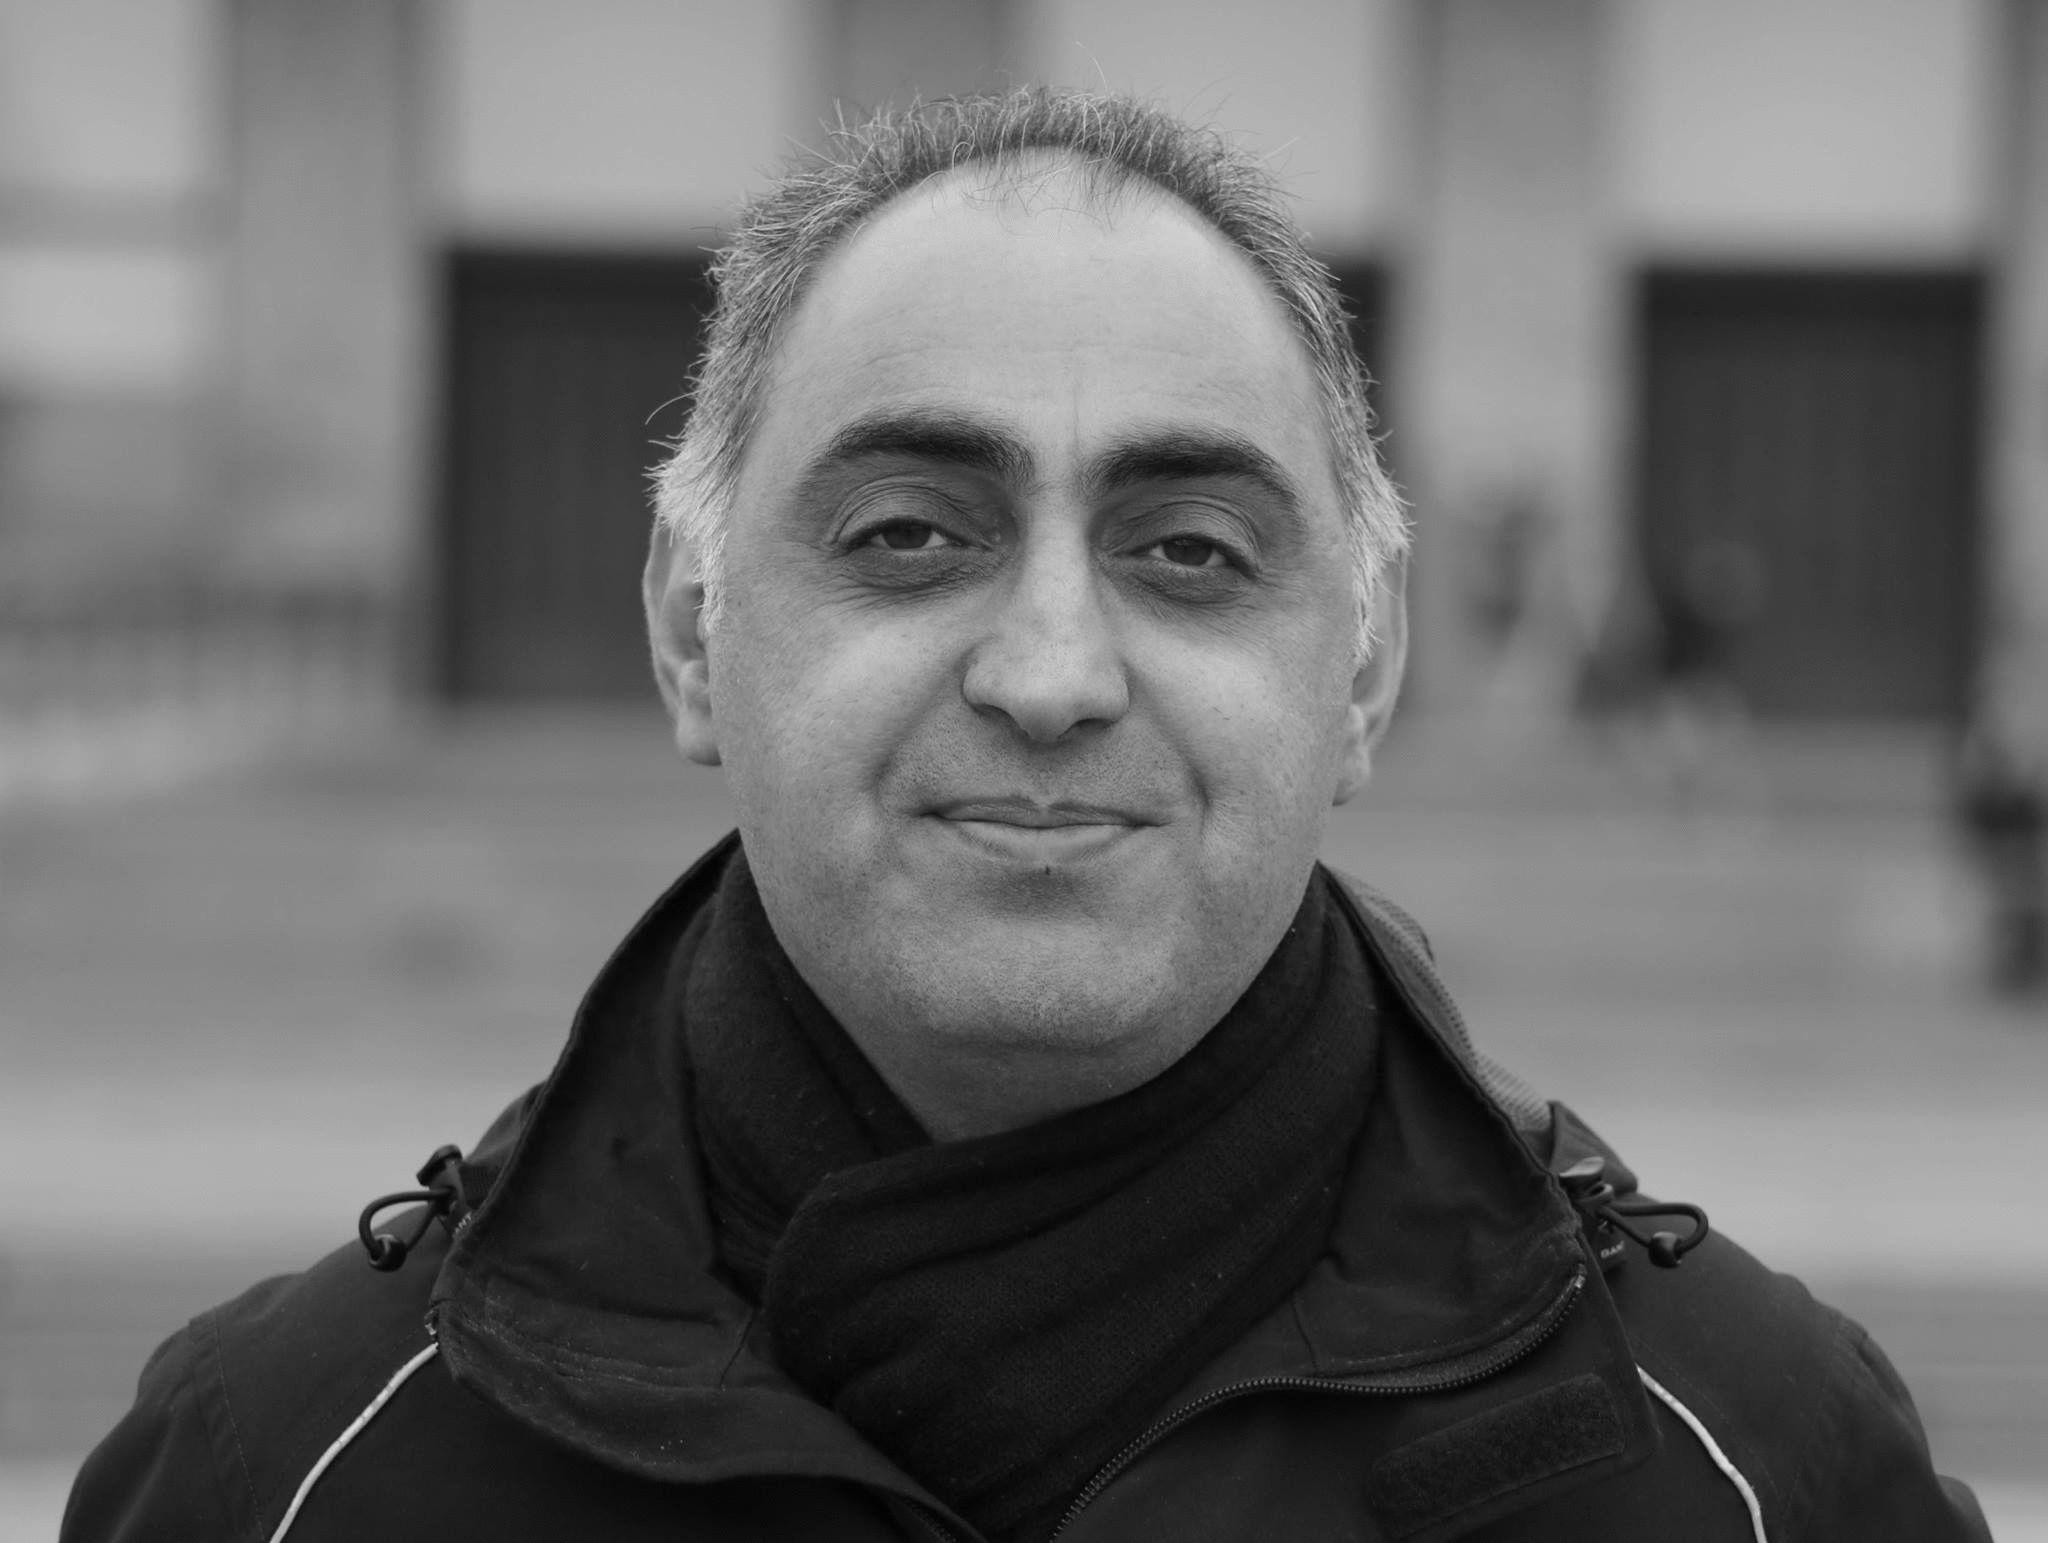 مسعود عكو Headshot